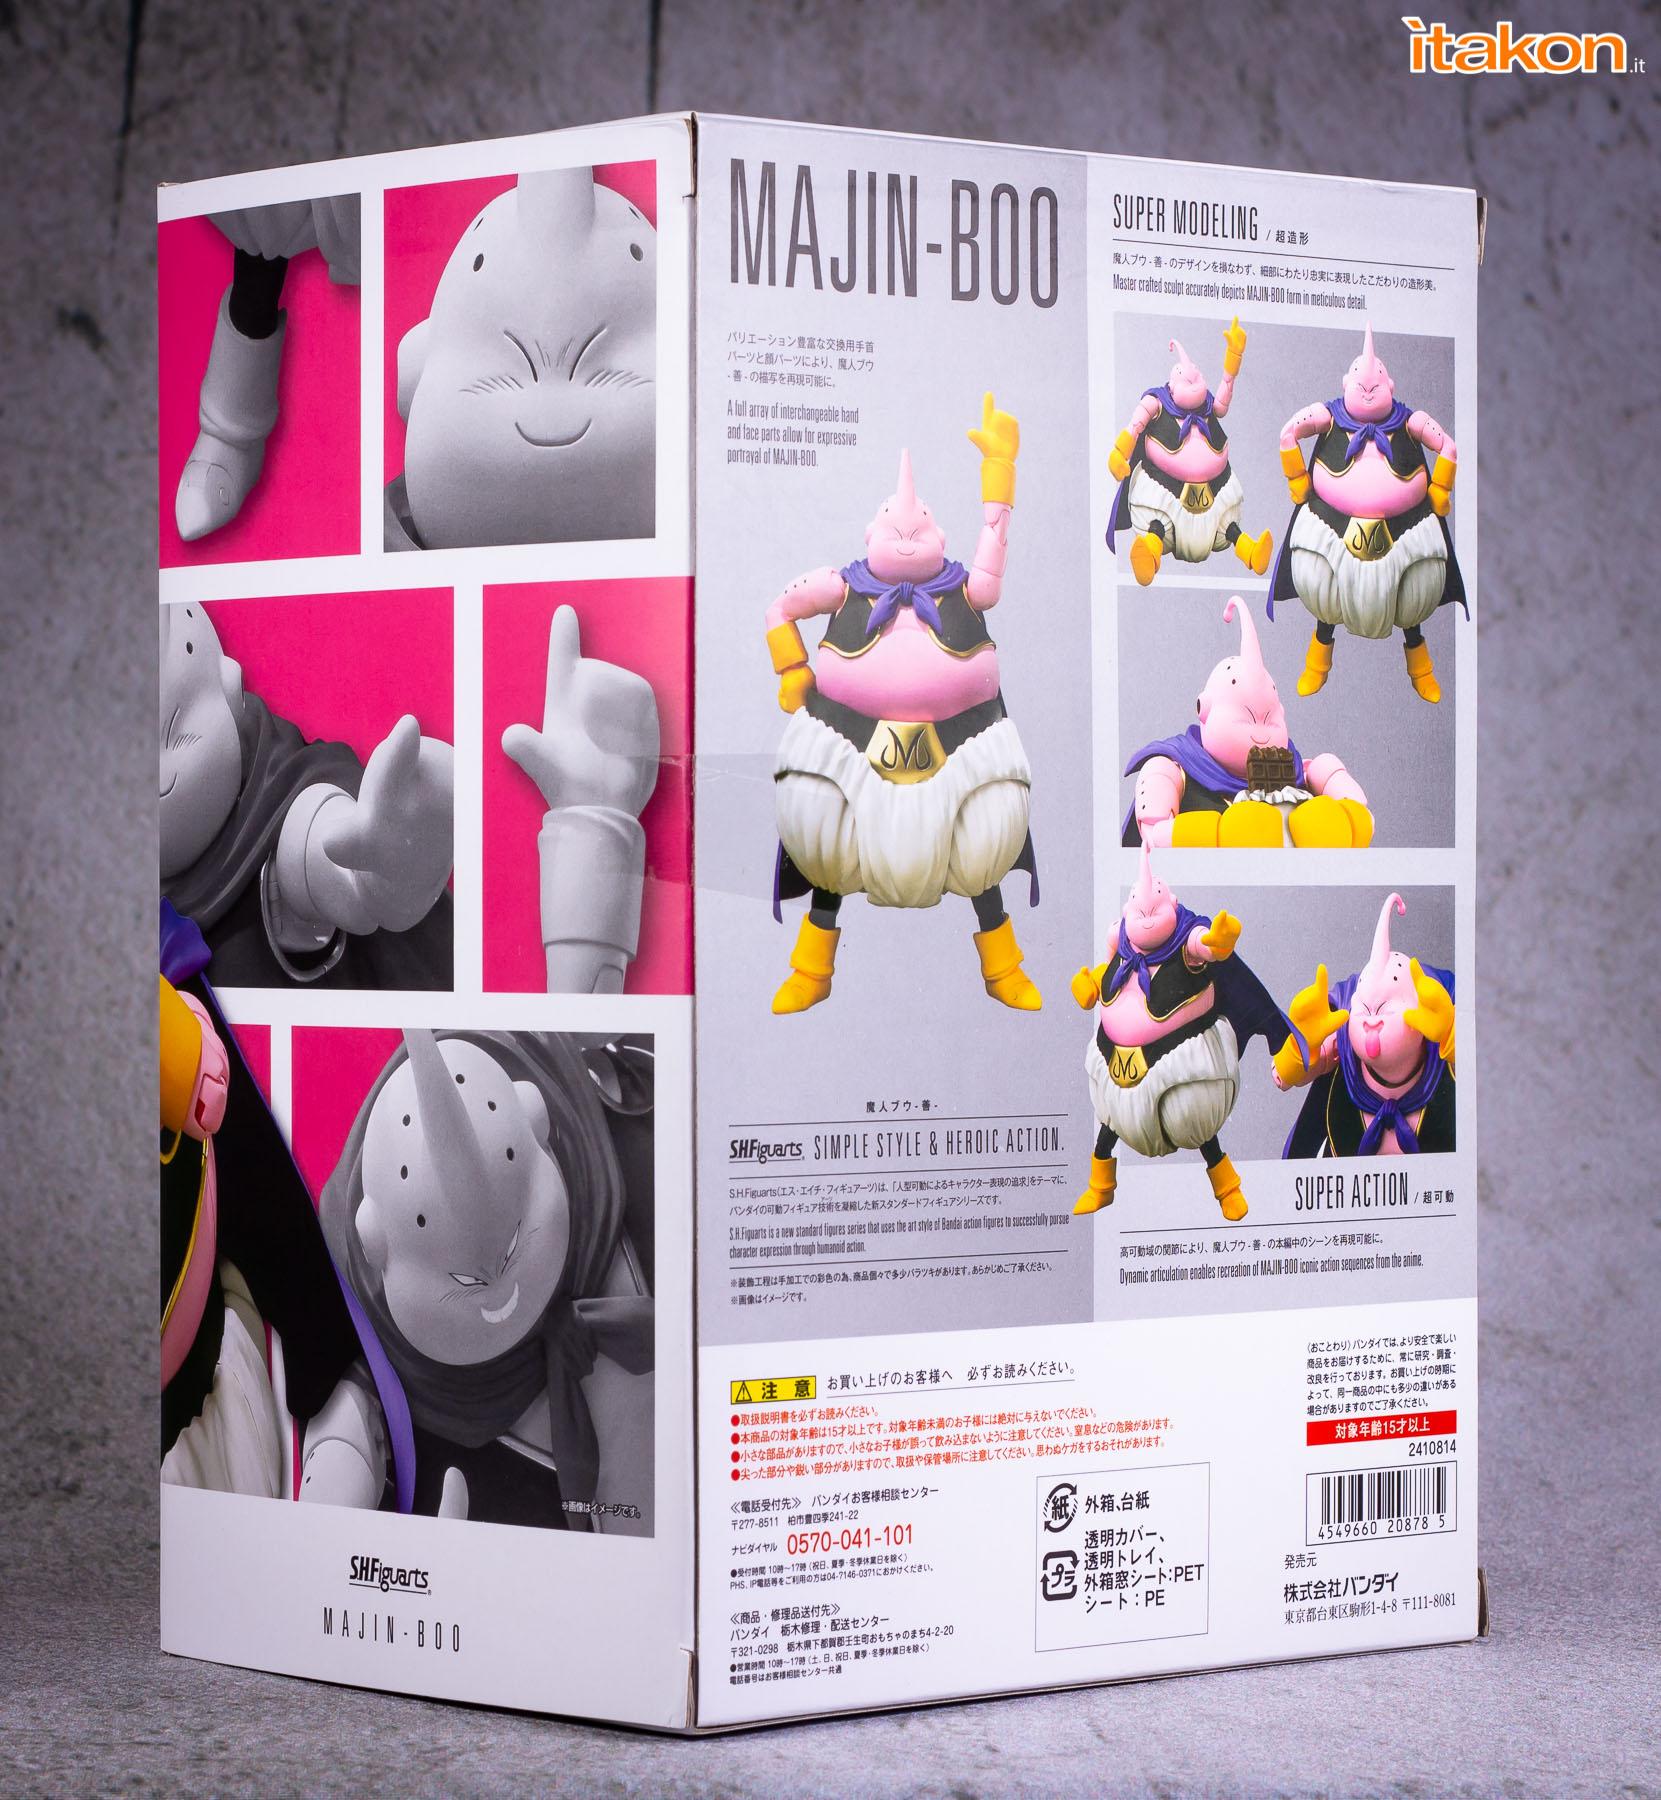 Link a Bandai sh figuarts Majin buu review recensione-4